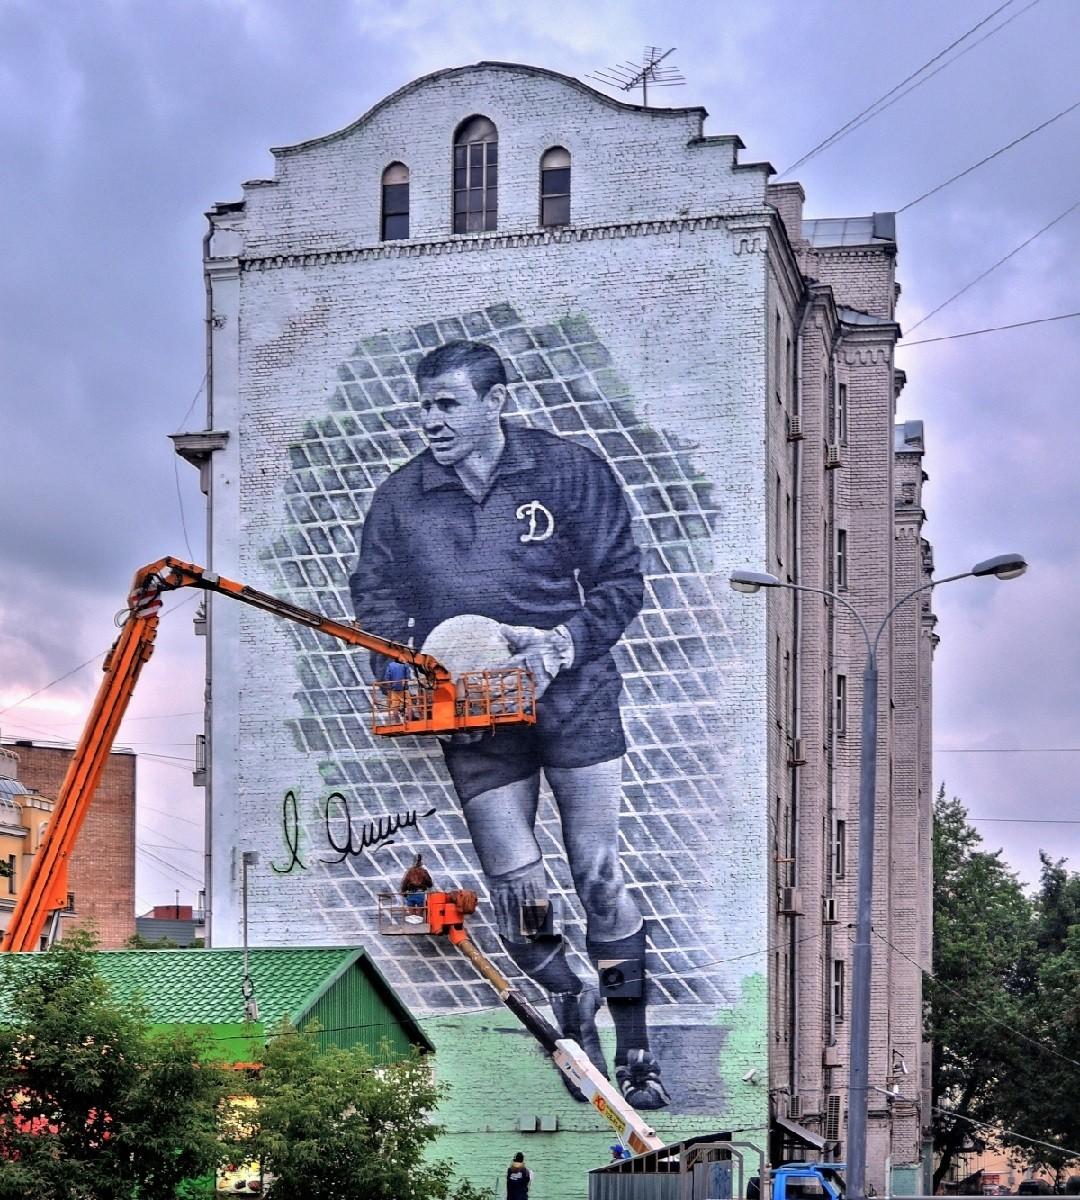 Mural en homenaje a Yashin, en el centro de Moscú (estación de metro Tagánskaia)